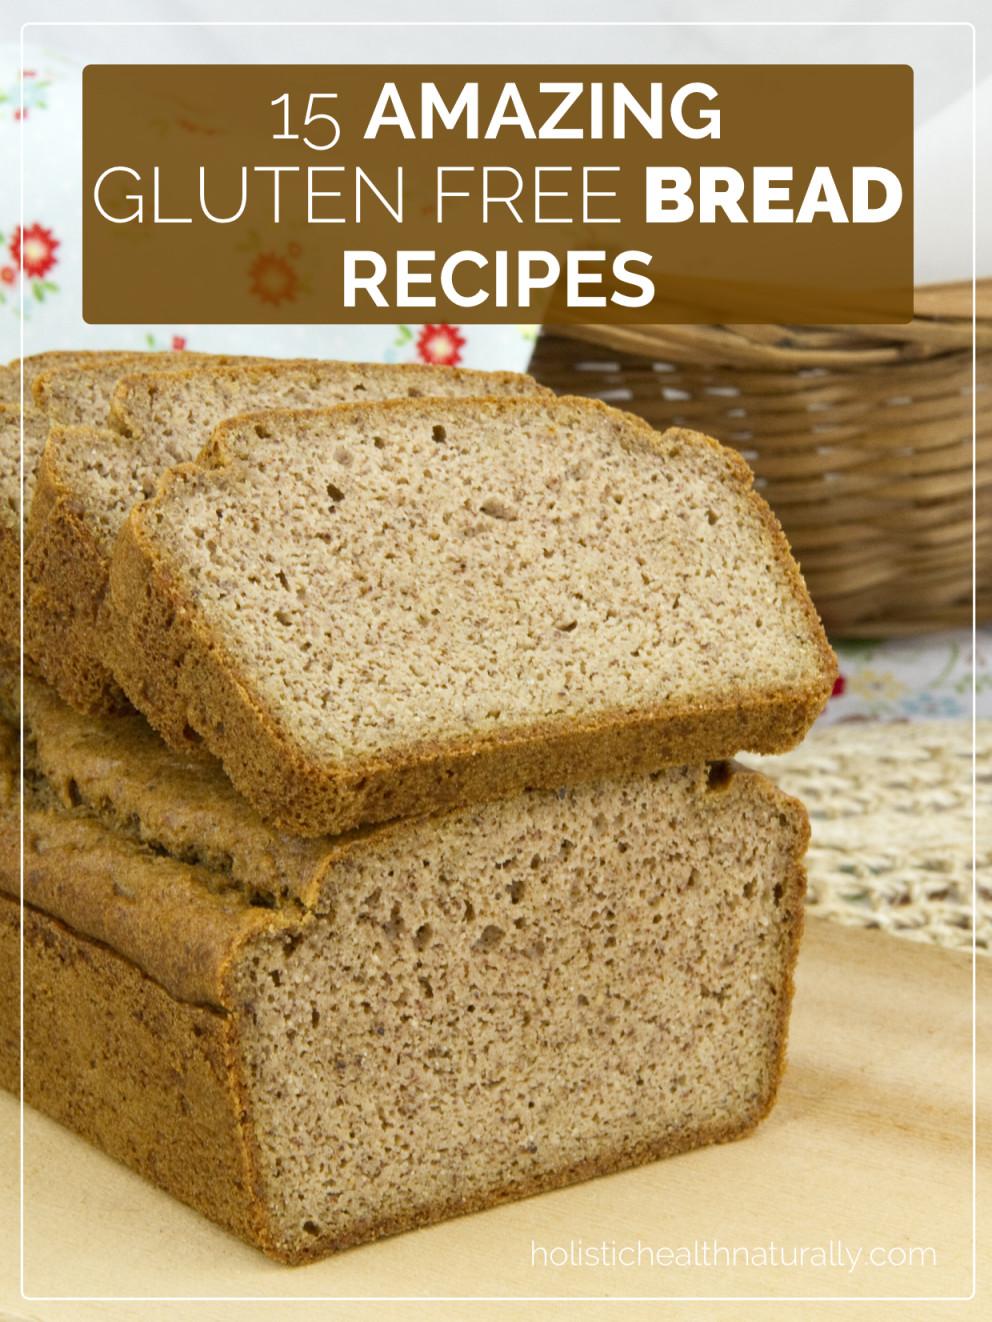 Gluten Free Dairy Free Bread  15 Amazing Gluten Free Bread Recipes